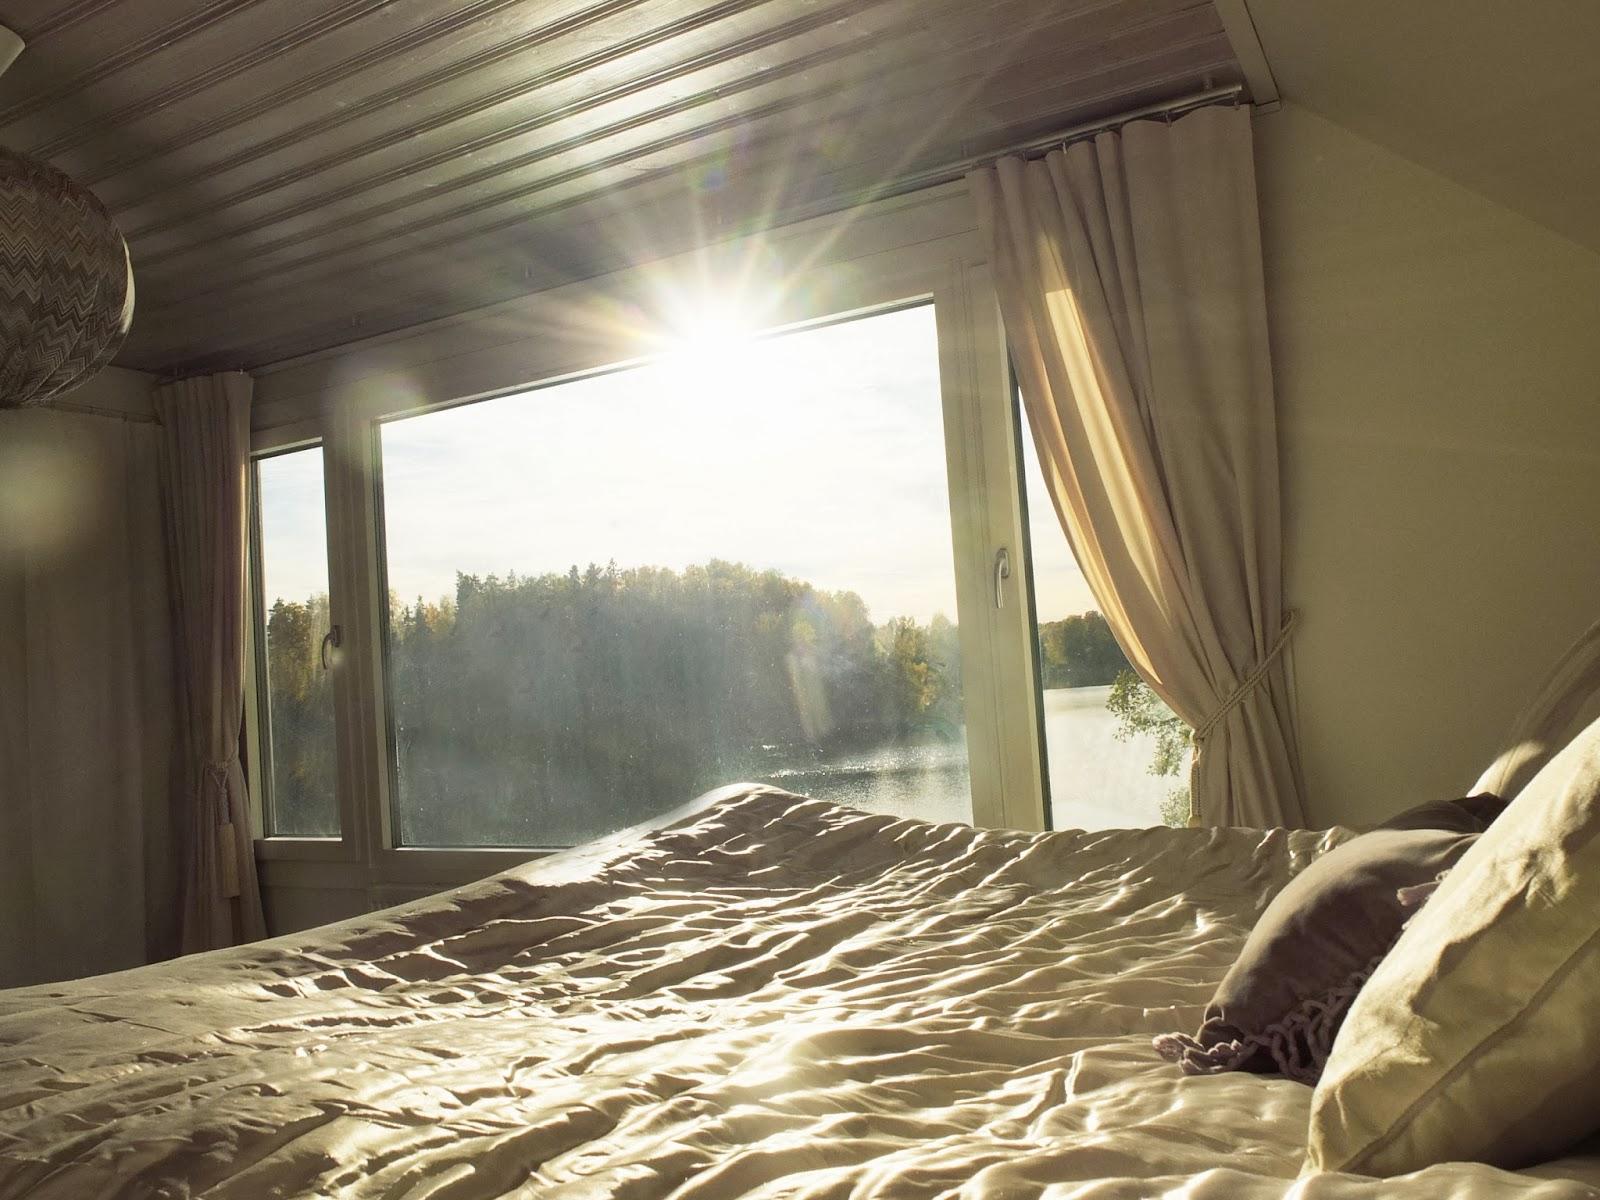 A house by a lake: sovrummet i olika ljus